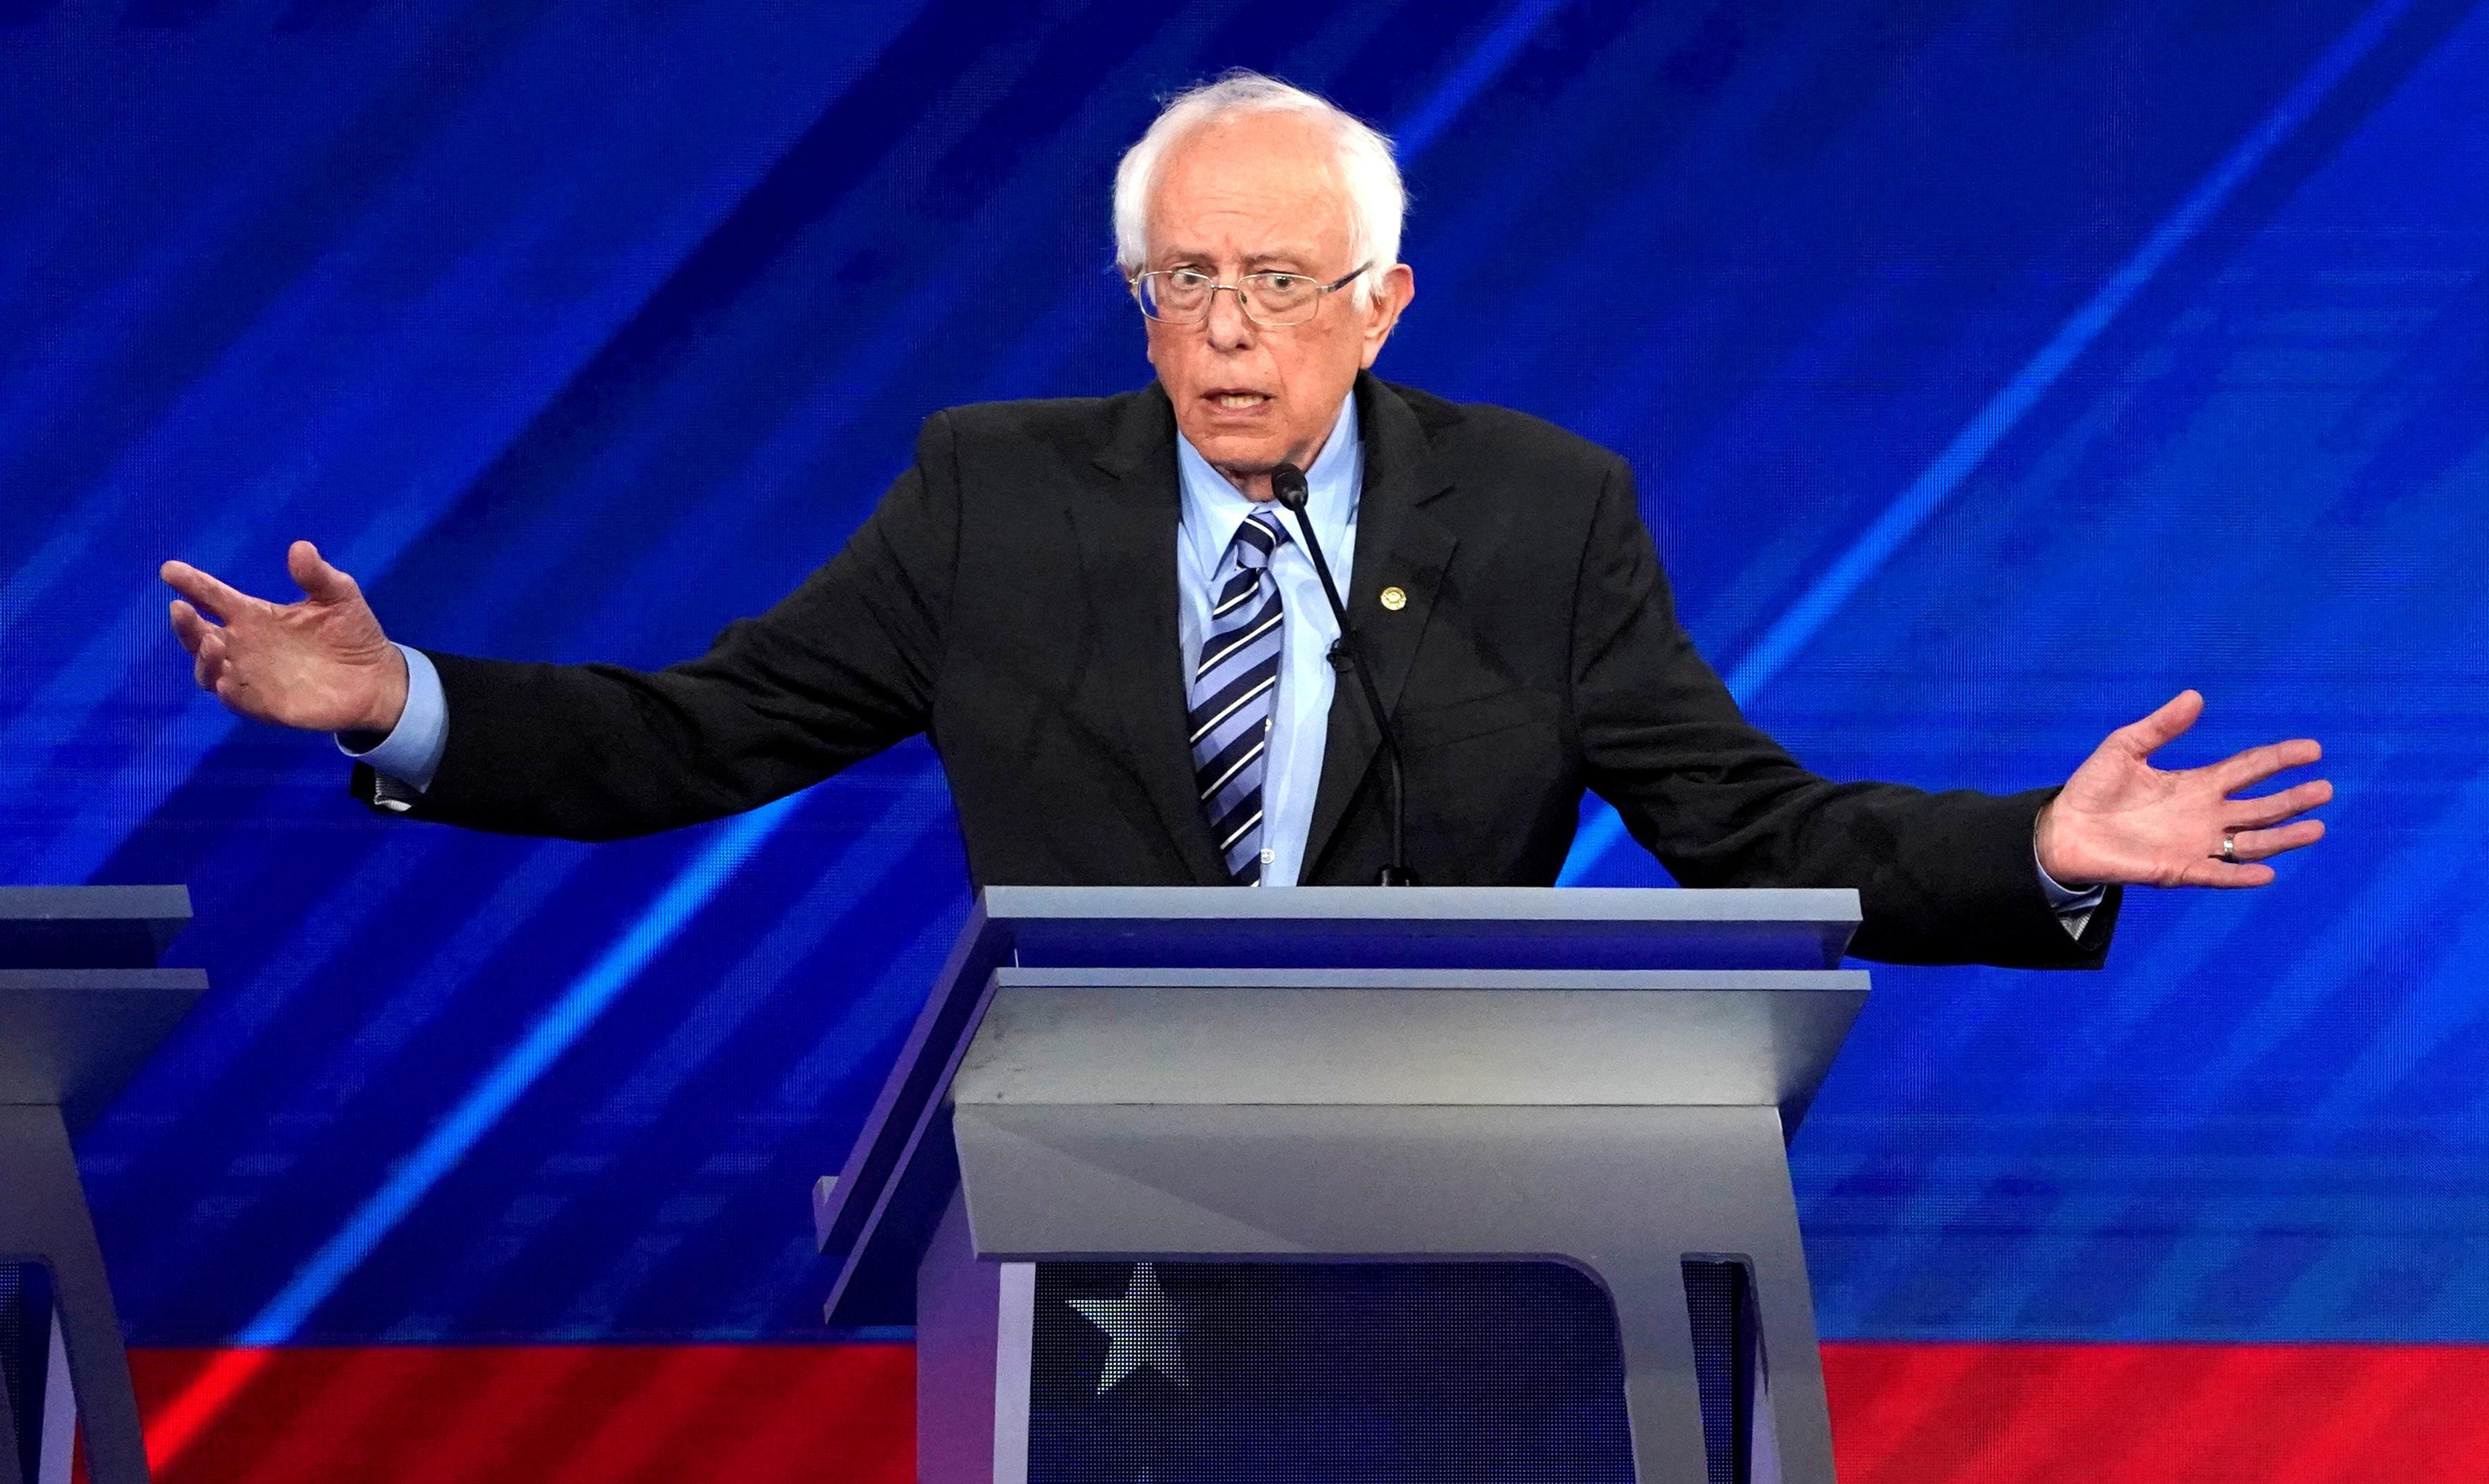 Sanders unveils economic plan a day before U.S. Democratic debate